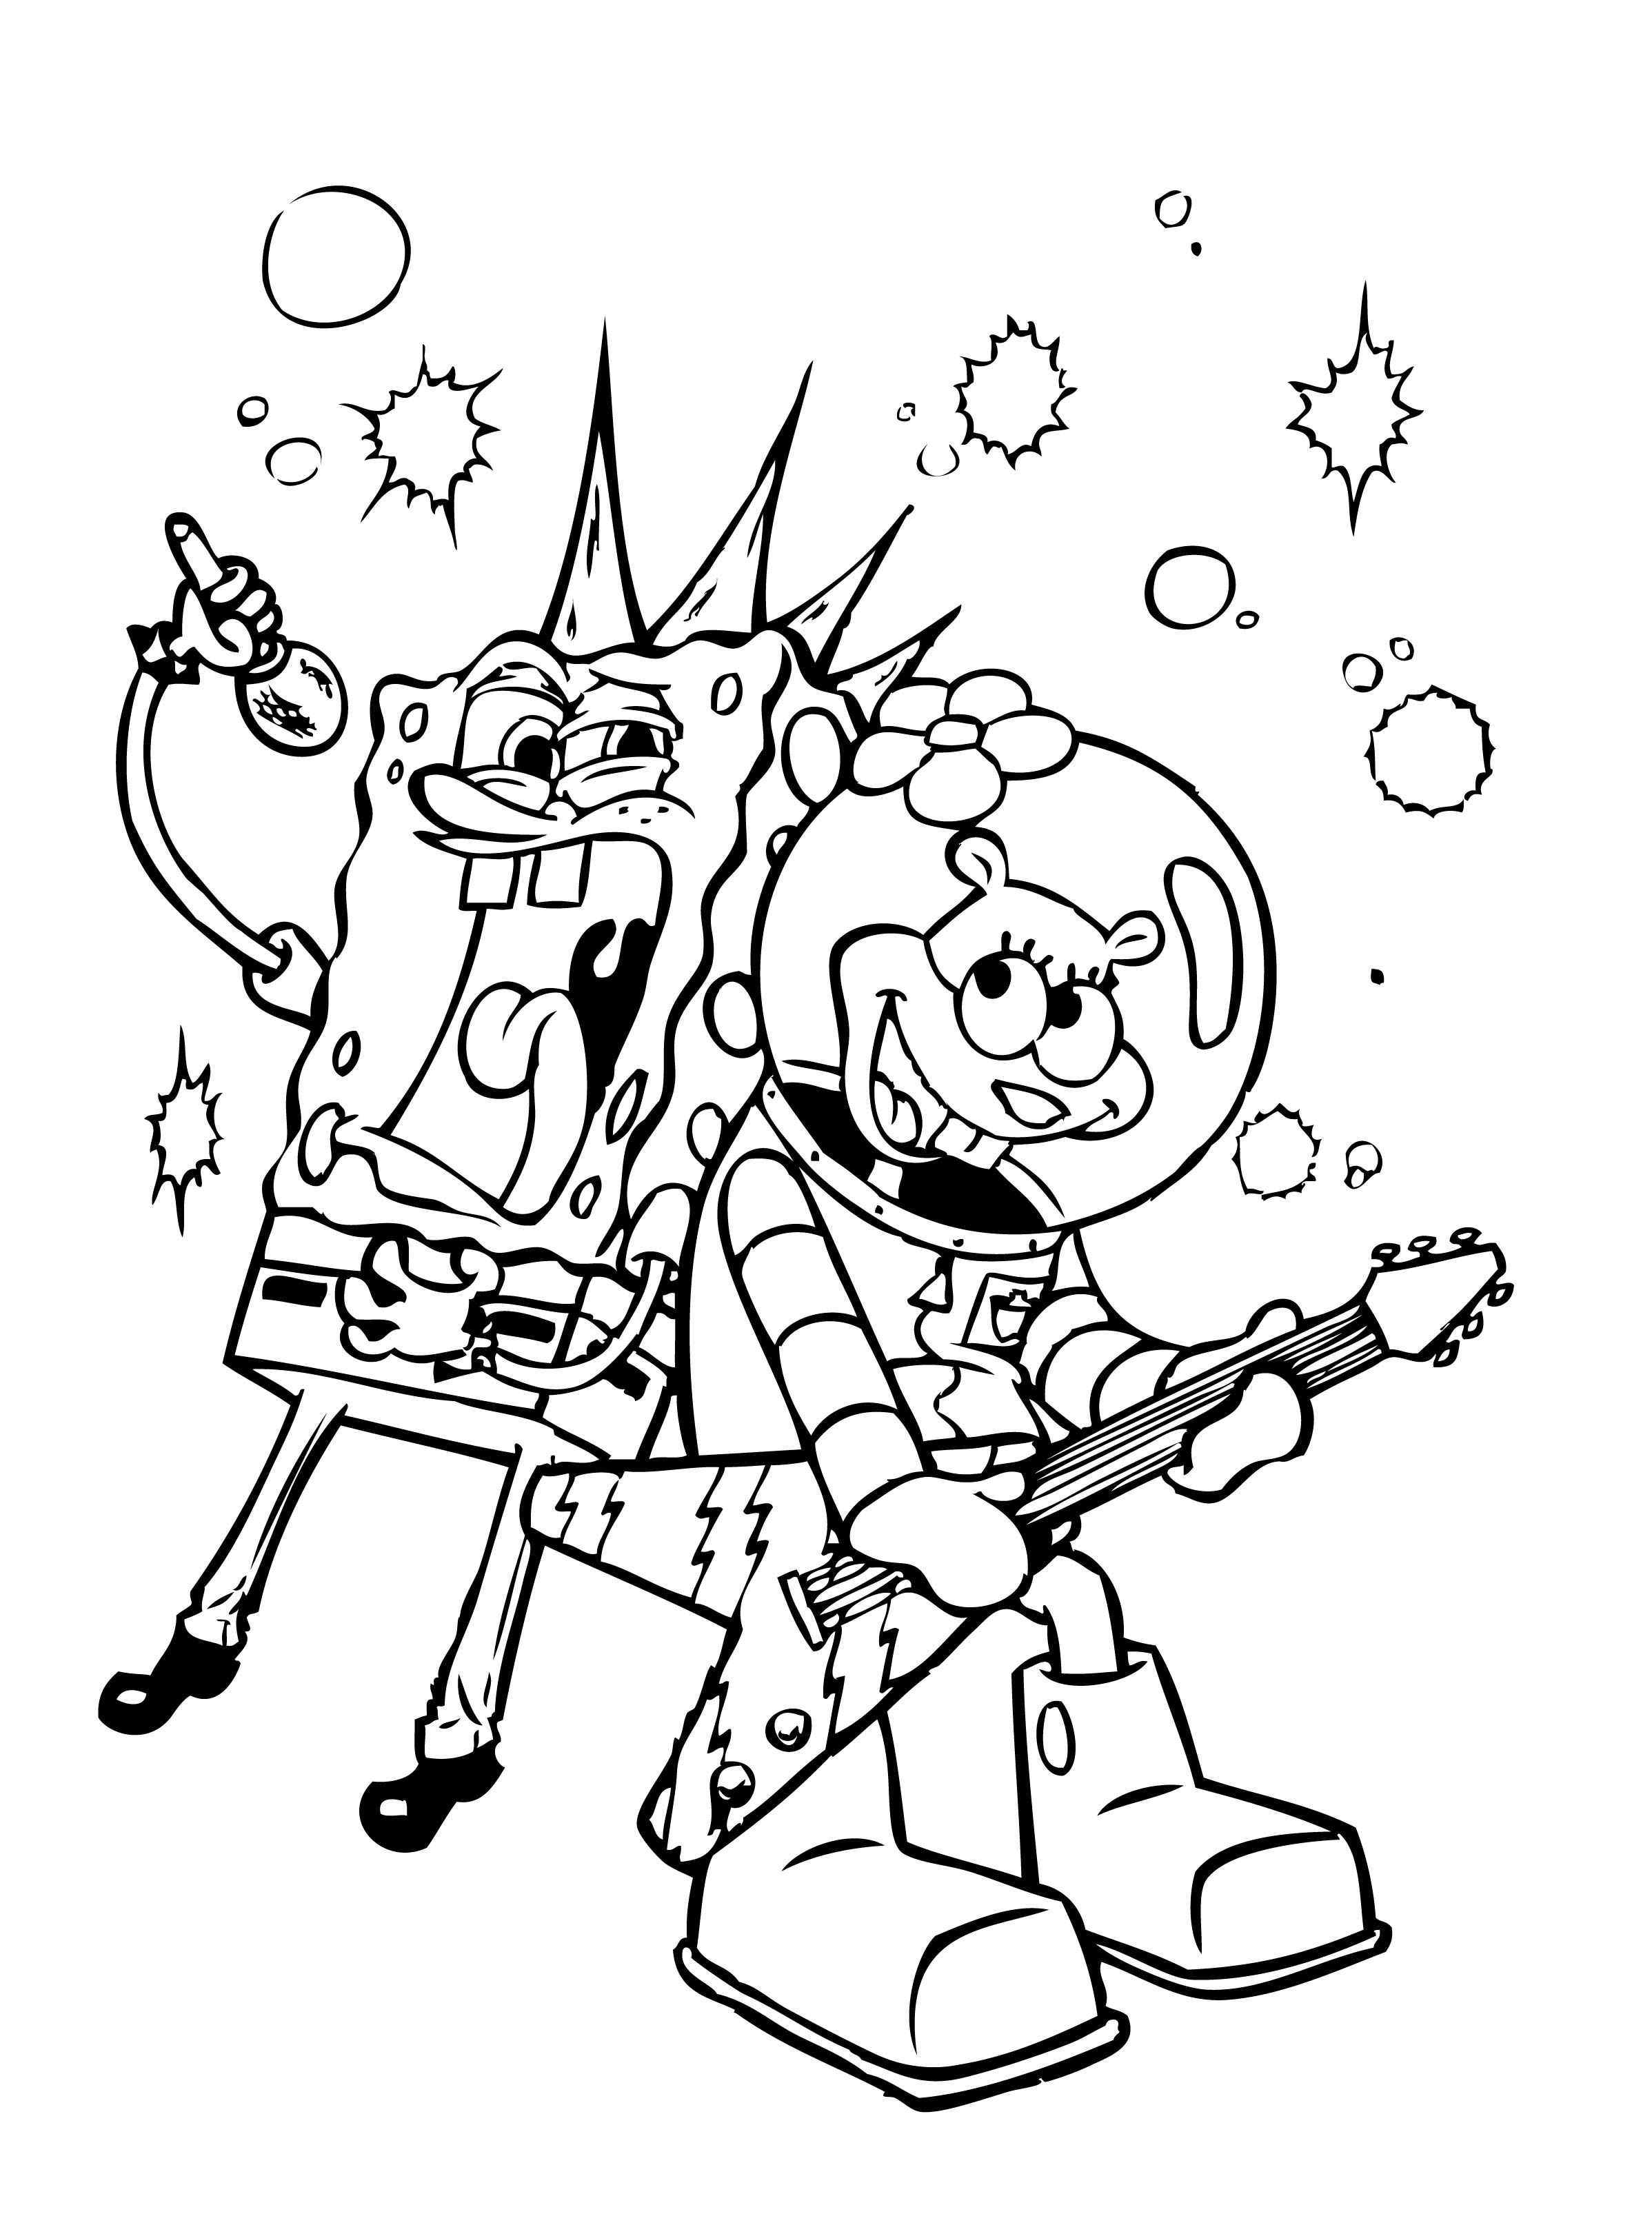 Spongebob Sing Coloring Pages Hd Wallpaper Spongebob